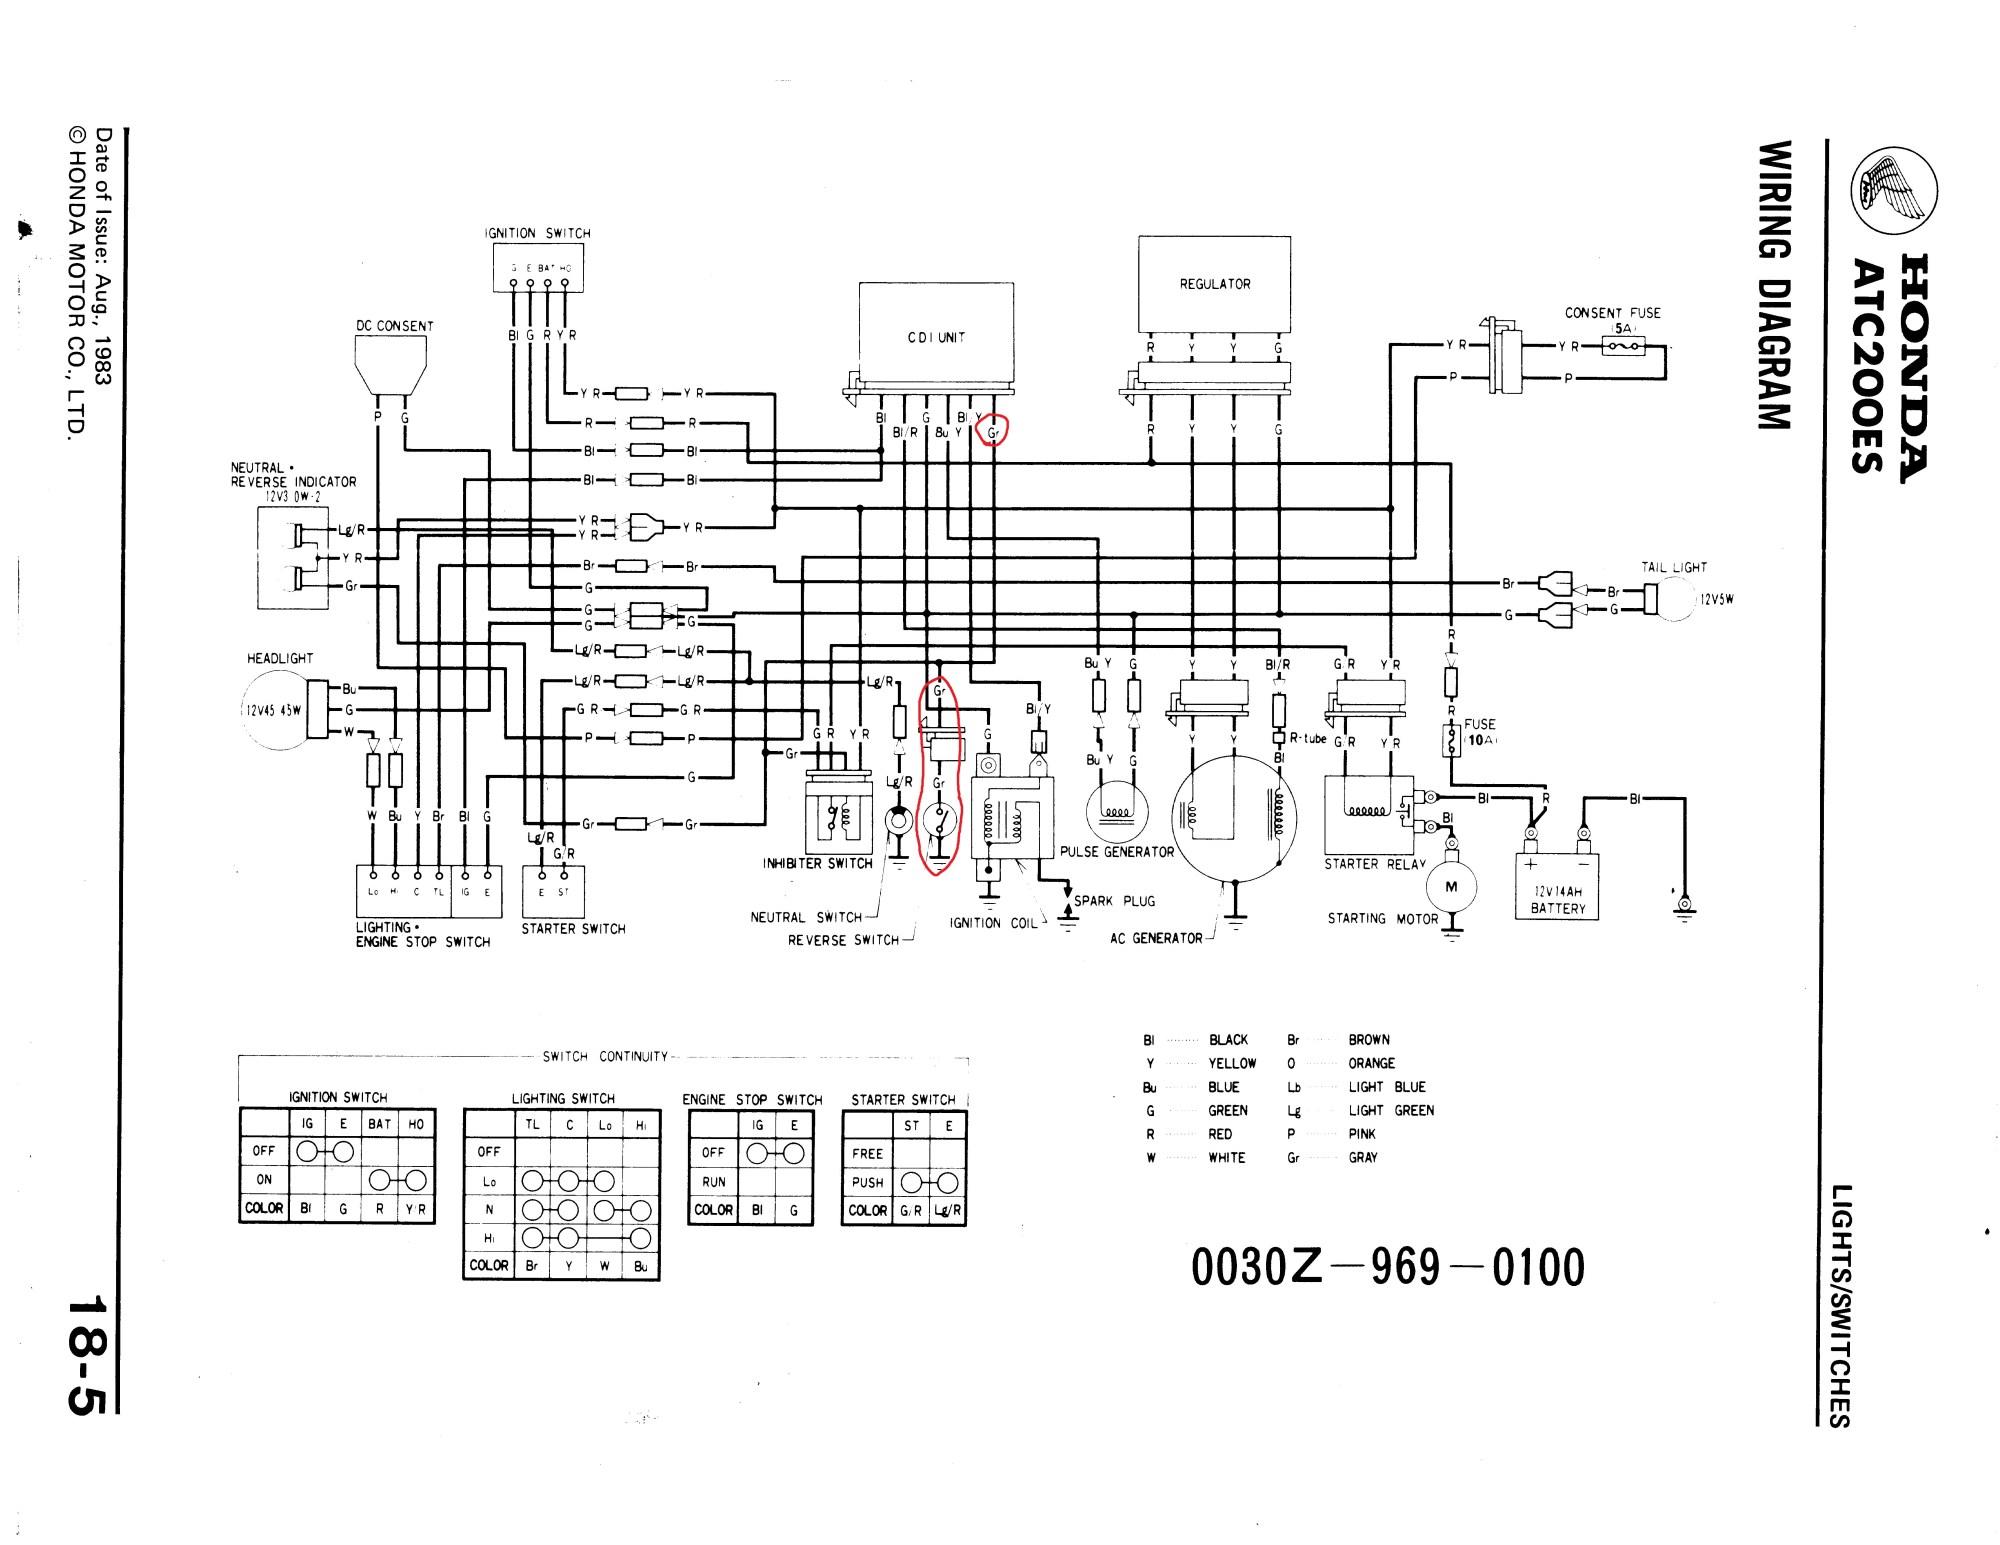 hight resolution of 1998 honda fourtrax 300 wiring diagram collection honda 300 fourtrax wiring 18 f